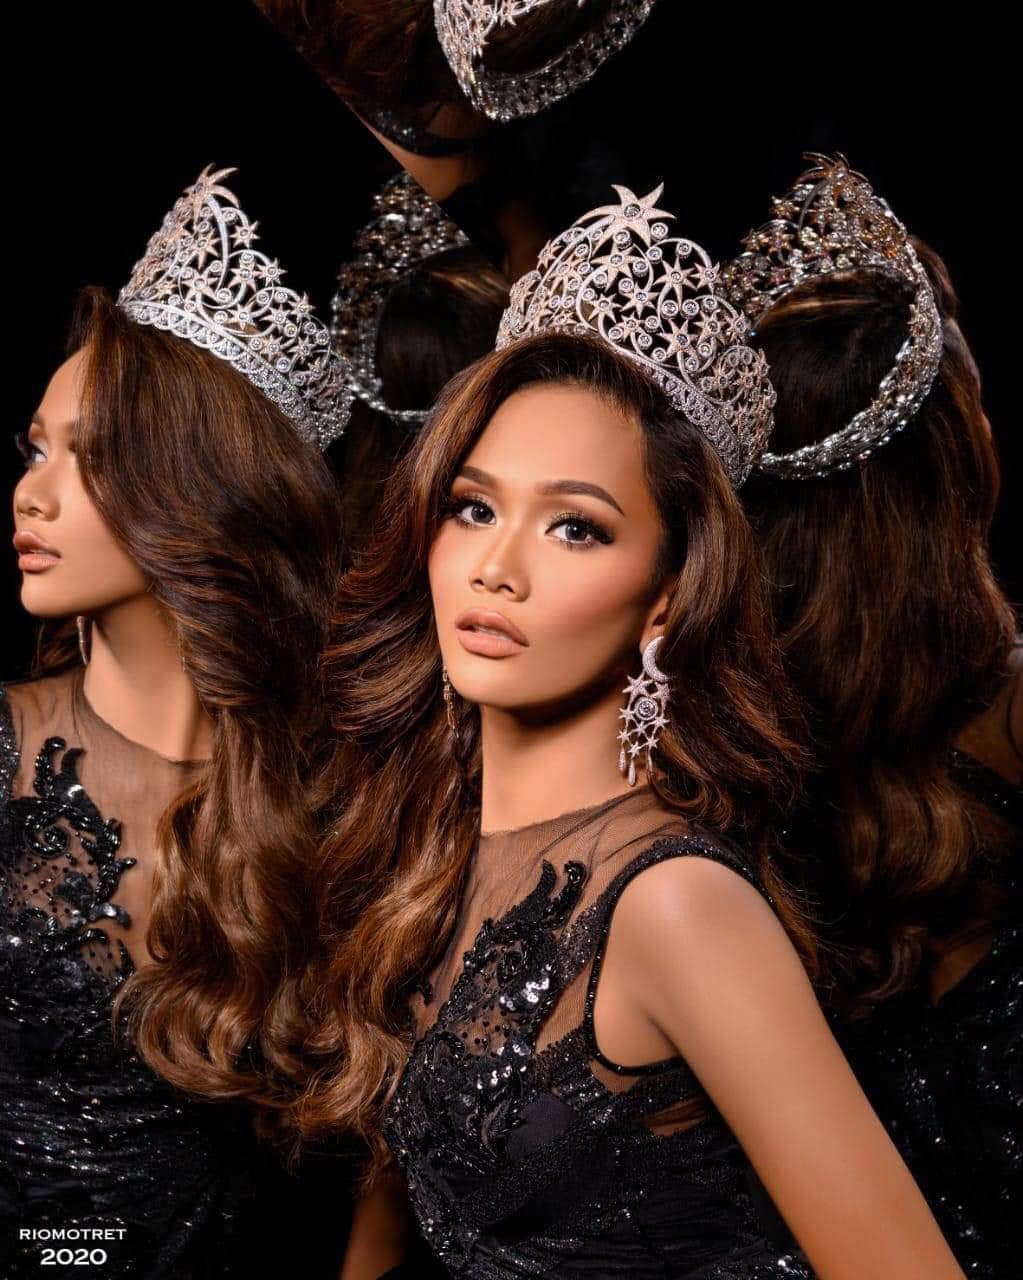 Aura-Kharisma-Miss-Grand-Indonesia-2020